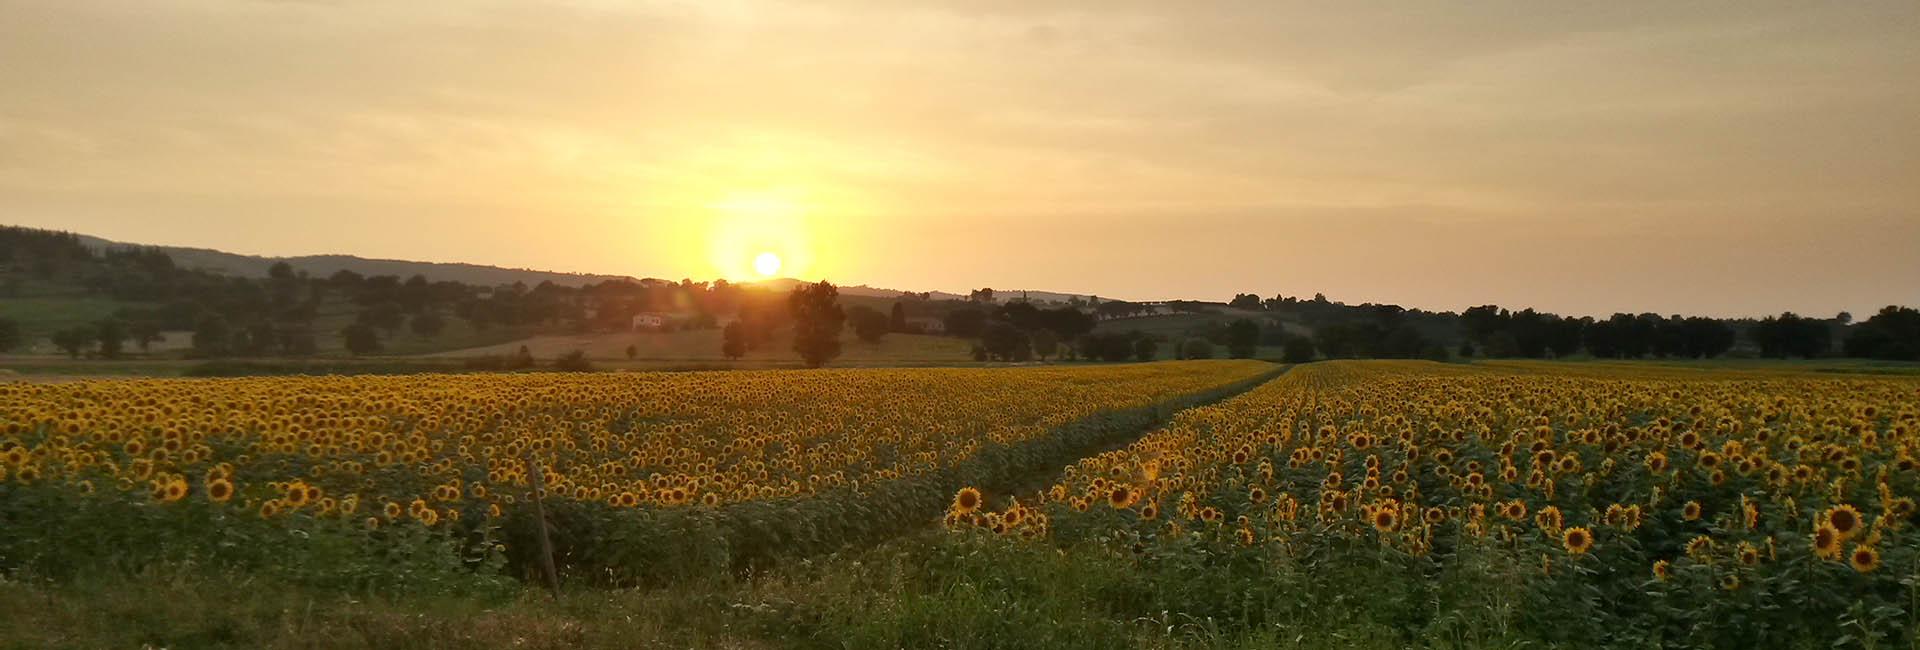 Agriturismo in Umbria - Panorama di girasoli